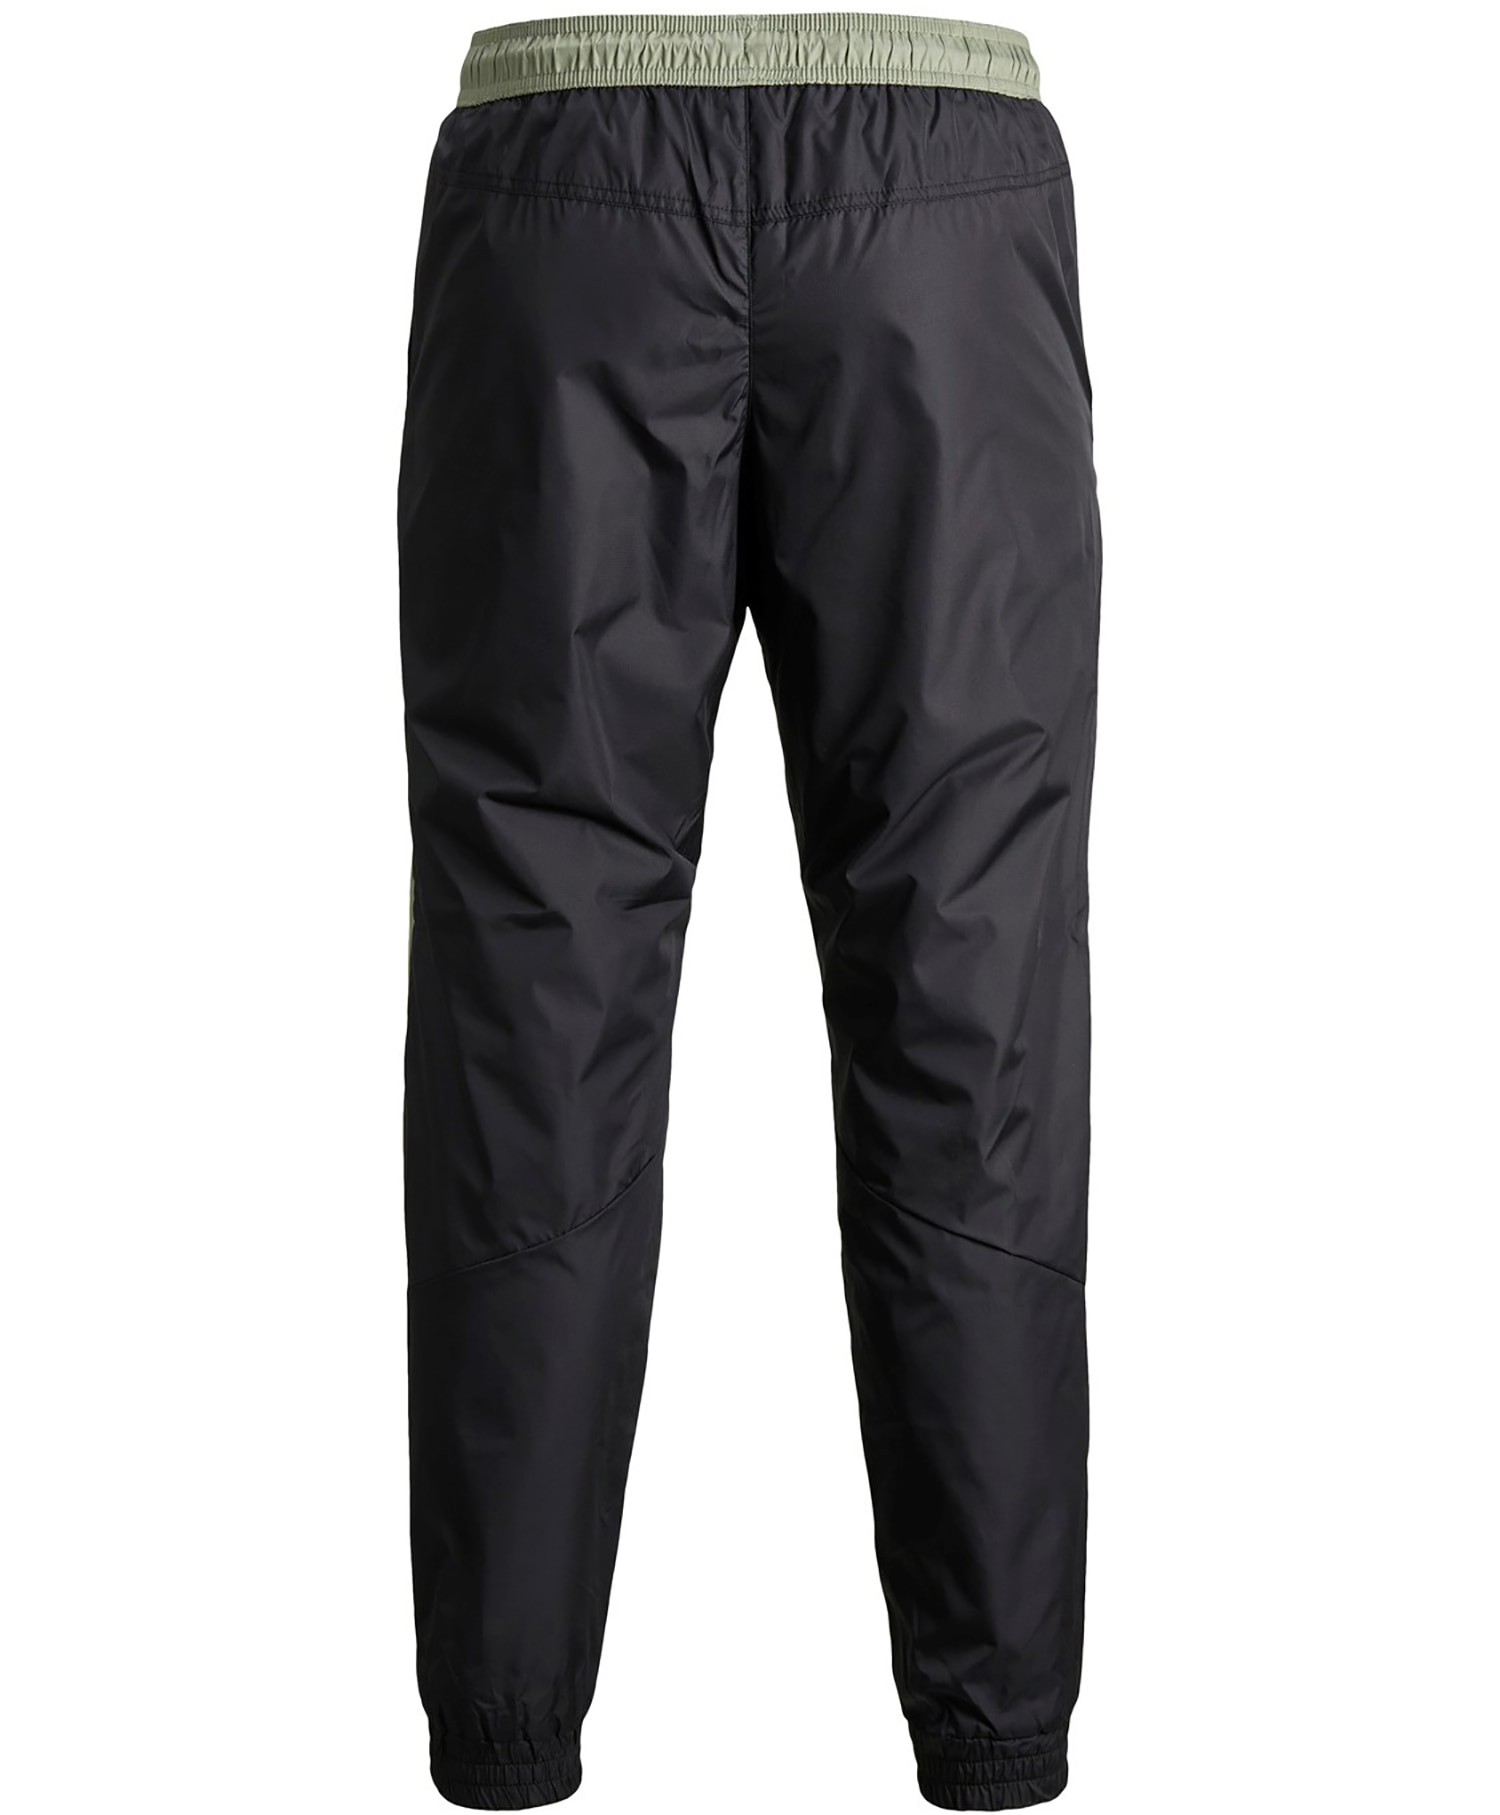 Jack&Jones Rodman track pants